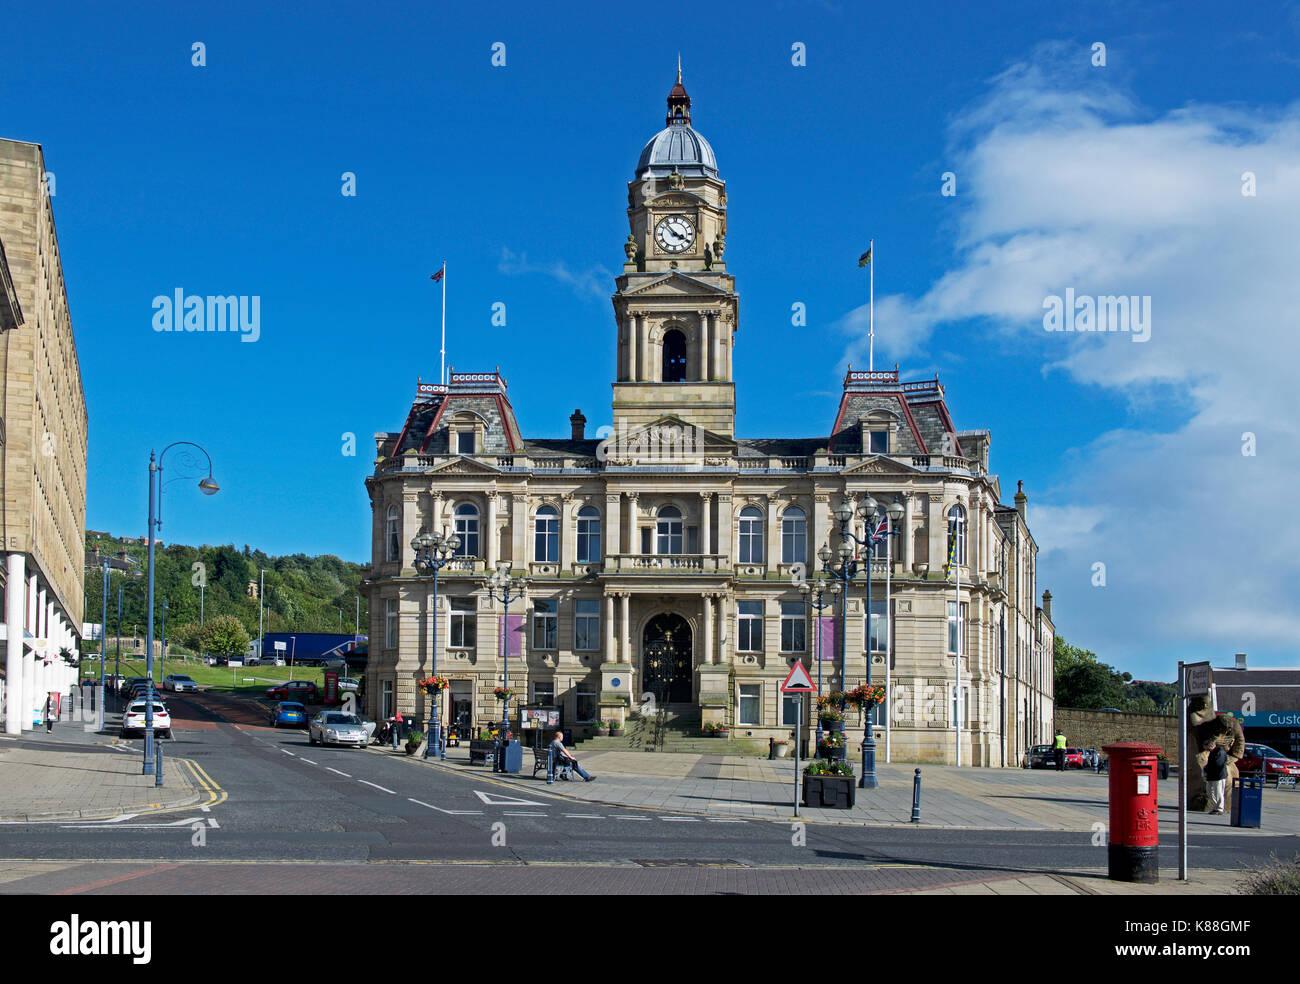 Town Hall, Dewsbury, West Yorkshire, England UK - Stock Image